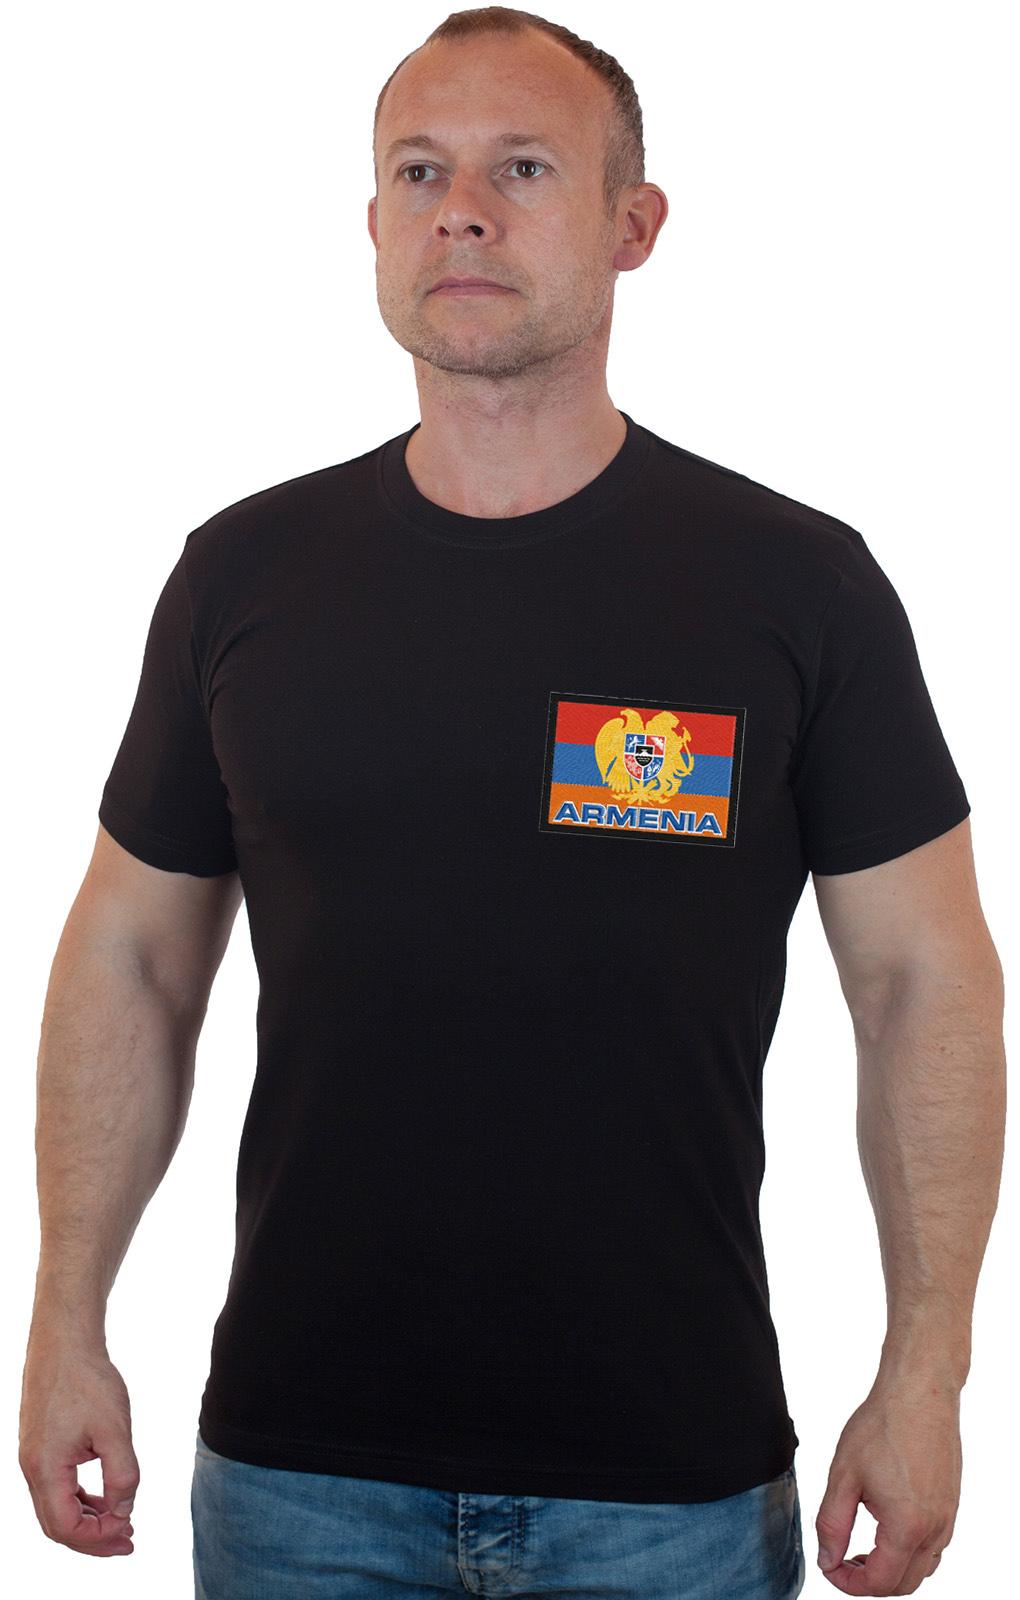 Мужская черная футболка с флагом Армении